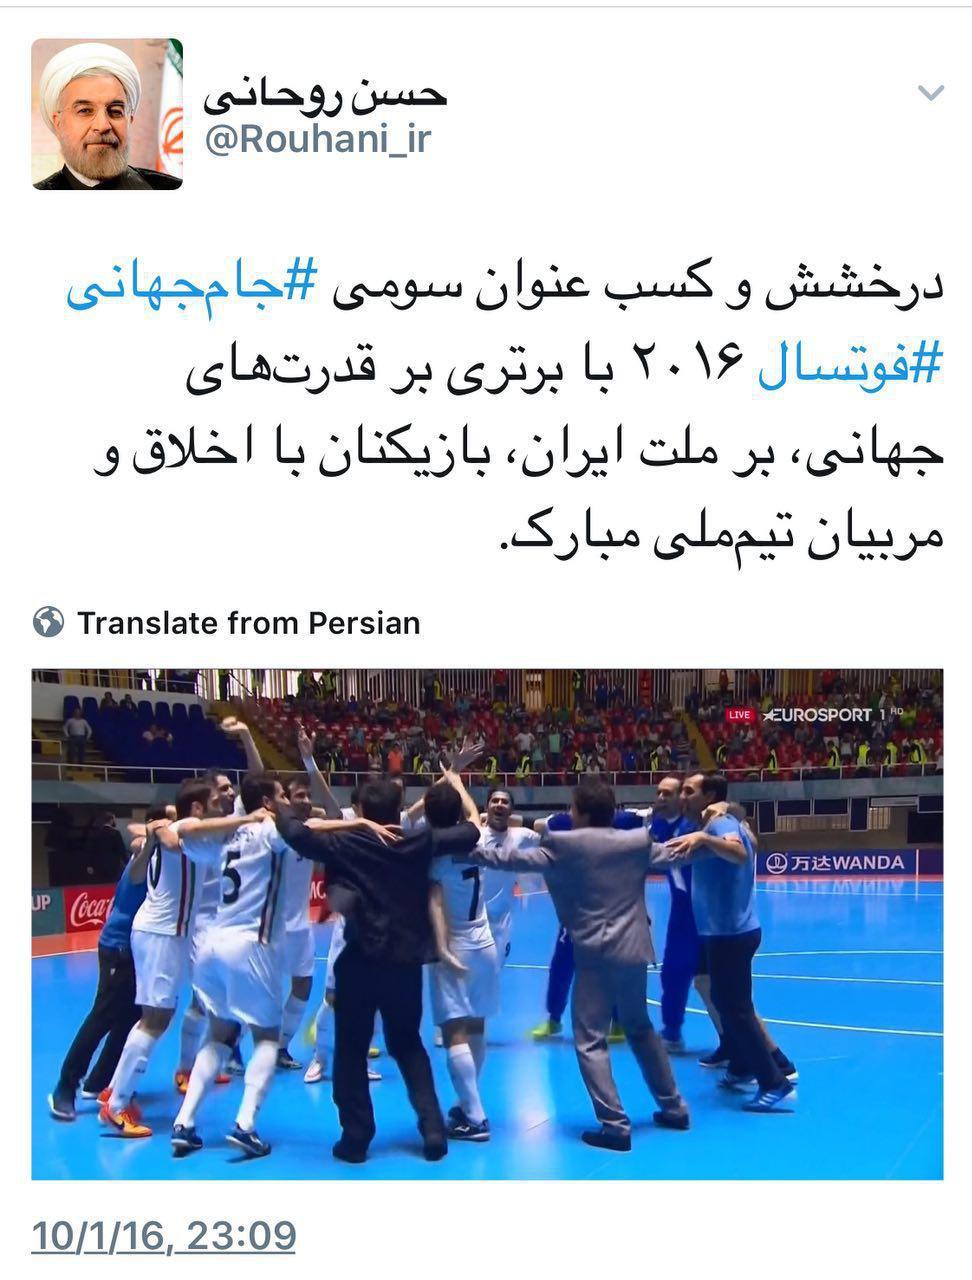 تبریک روحانی به تيم ملي فوتسال (عکس)